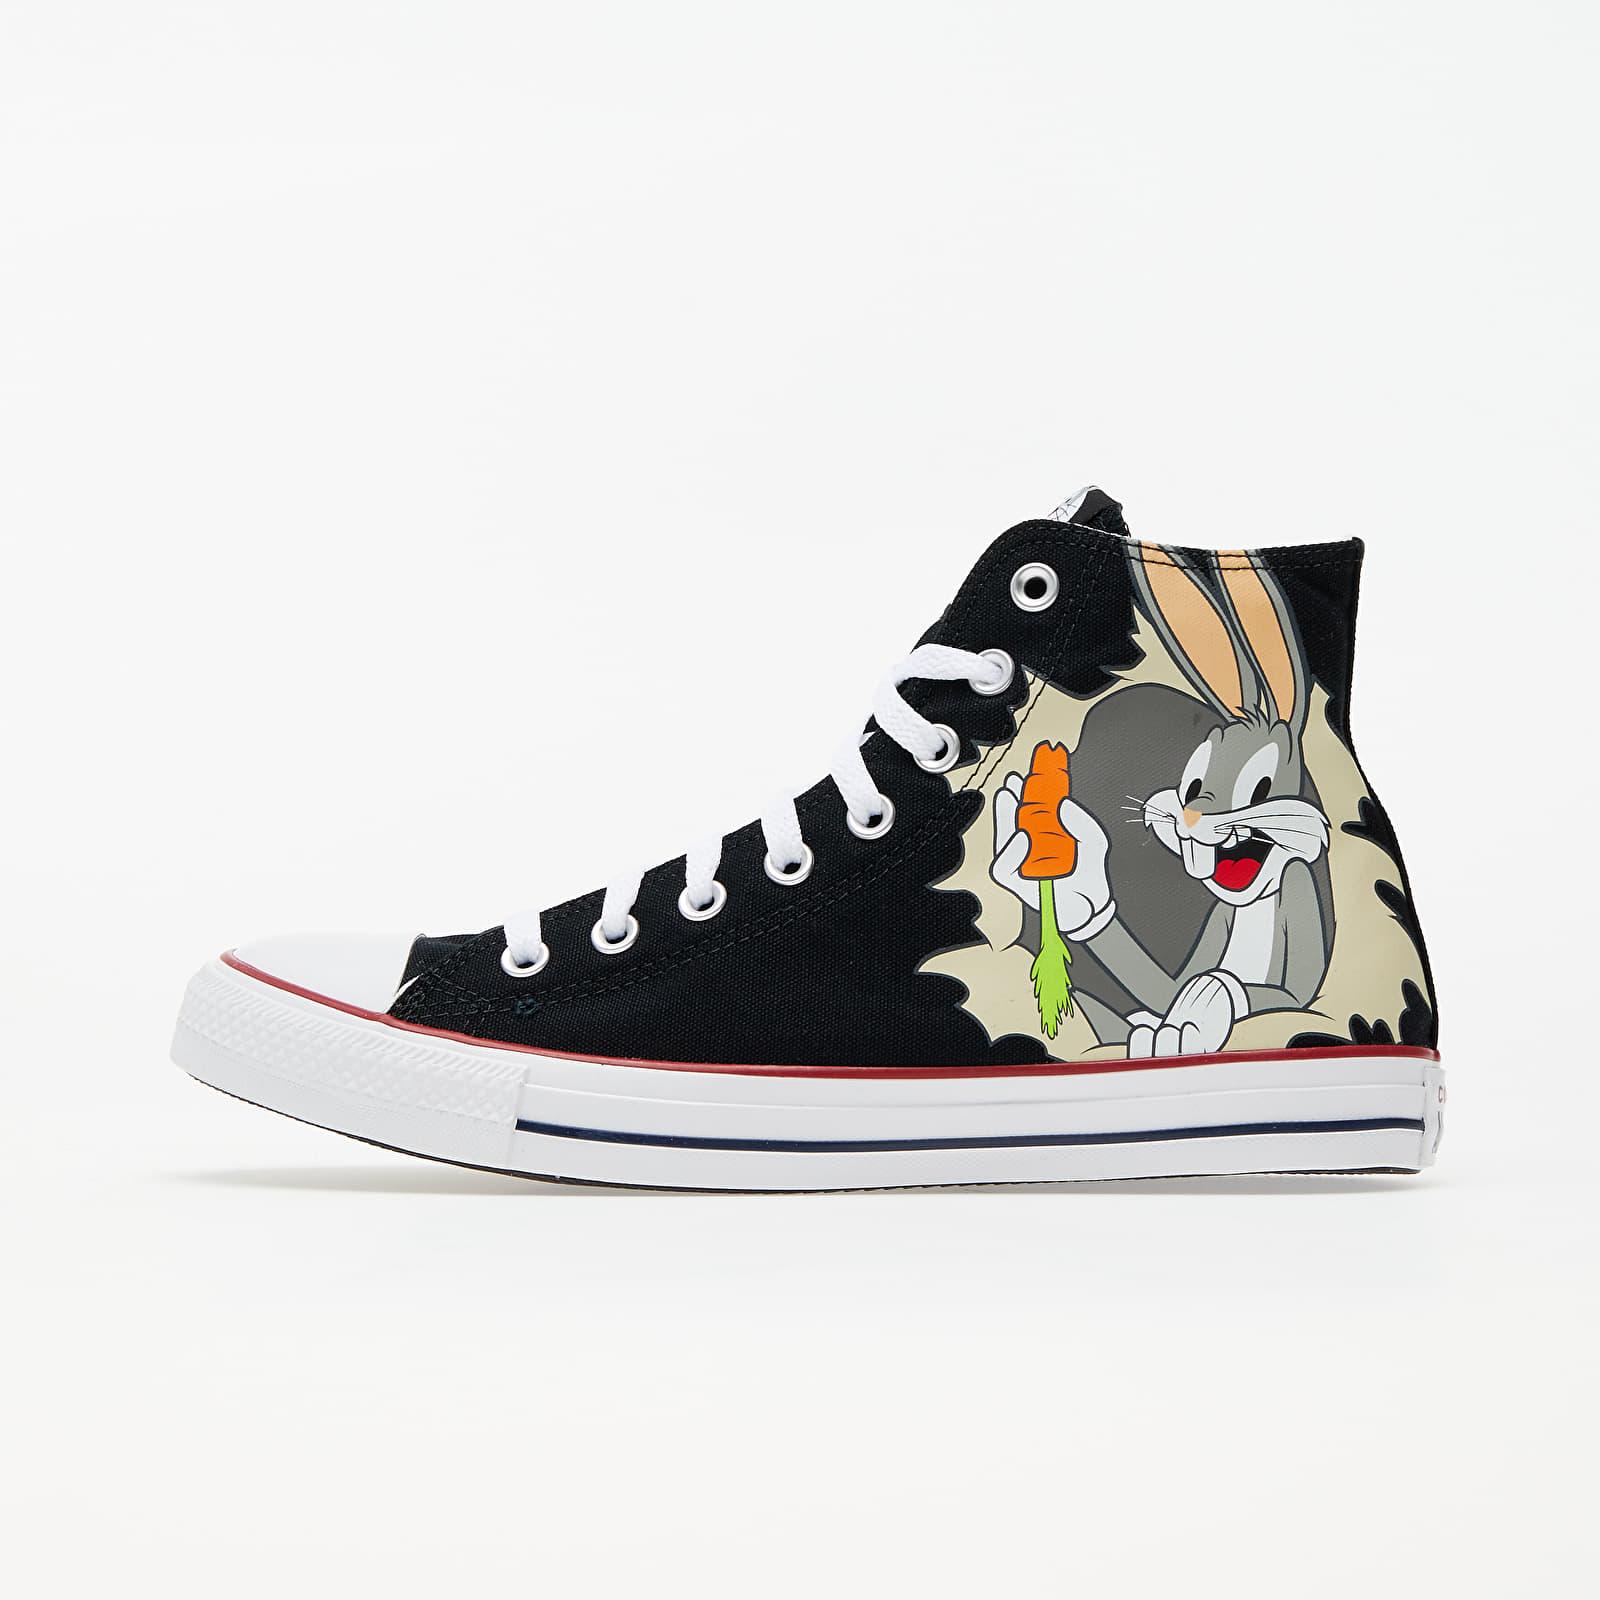 Converse x Bugs Bunny Chuck Taylor All Star Hi Black/ Multi 169225C